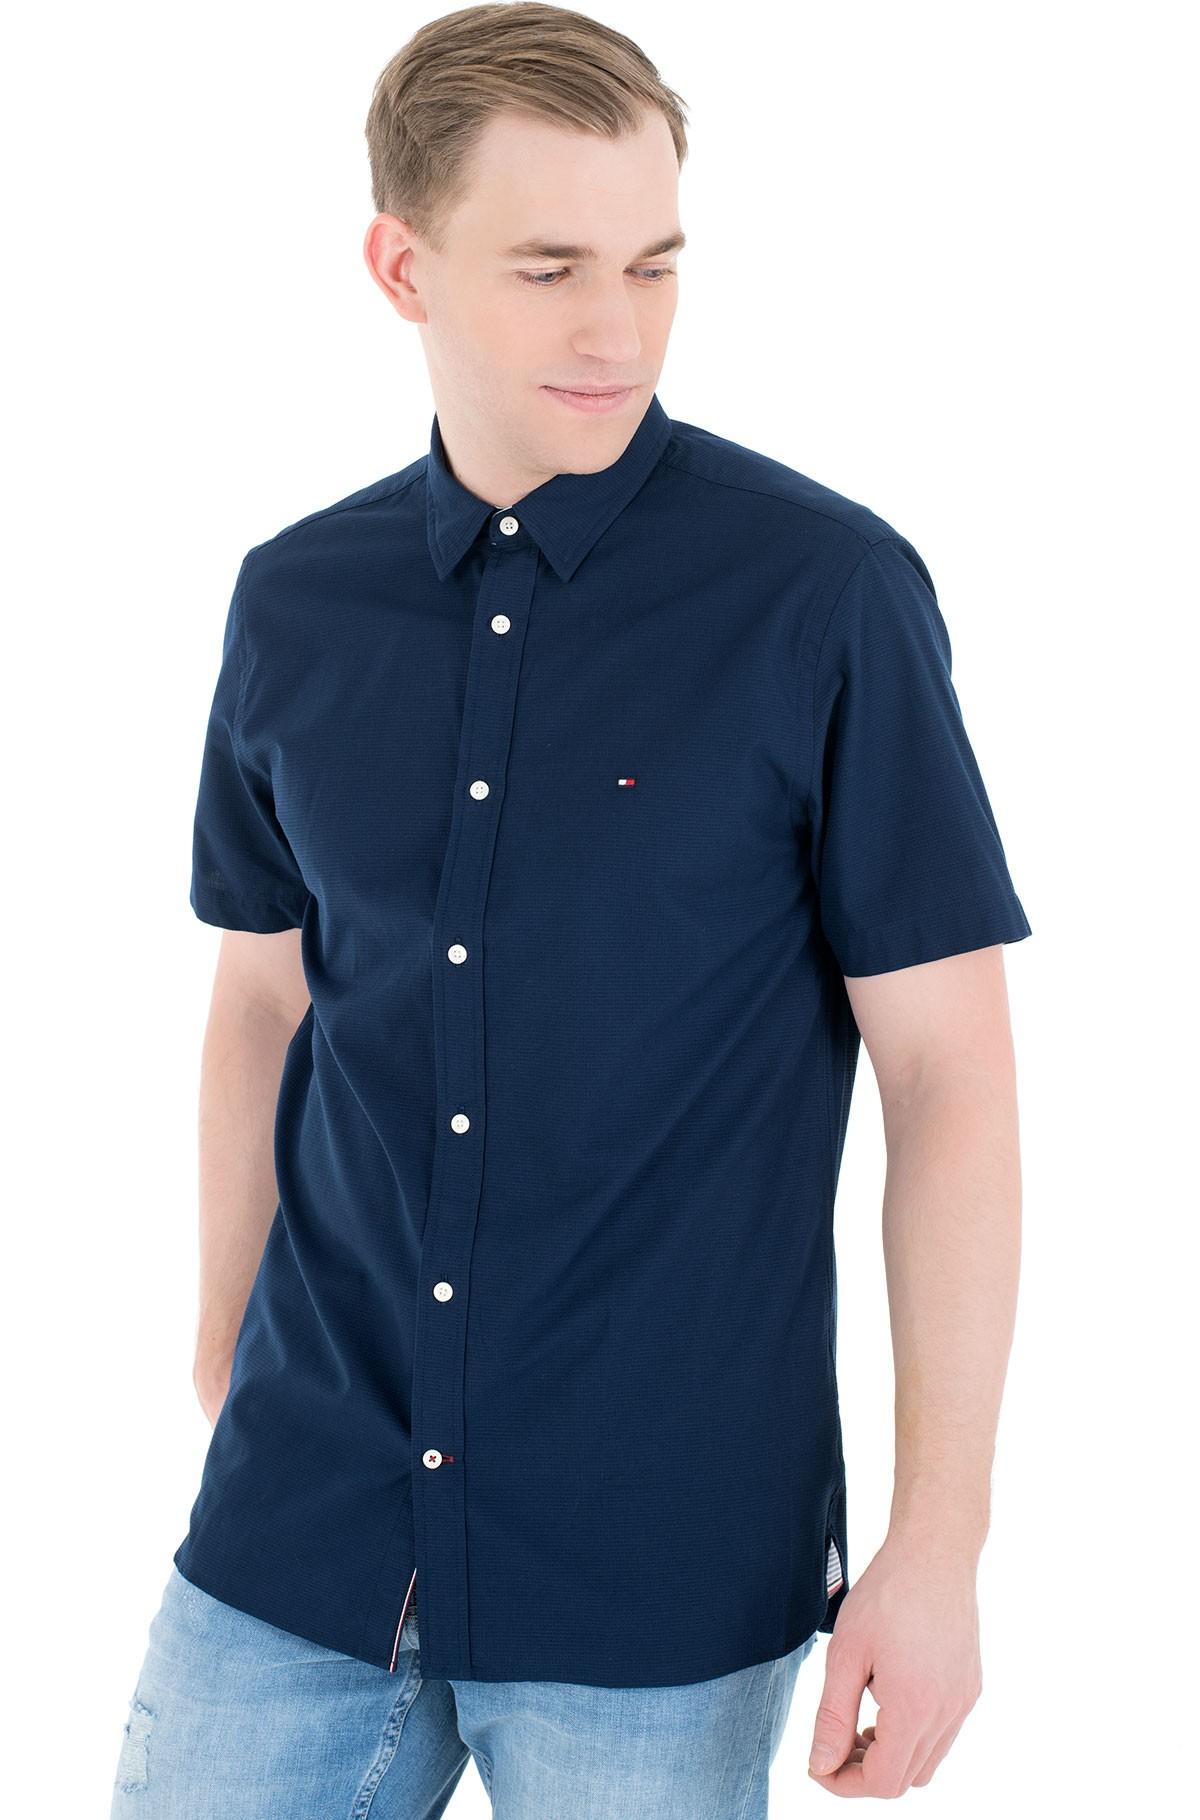 Short sleeve shirt GRID DOBBY SHIRT S/S-full-1